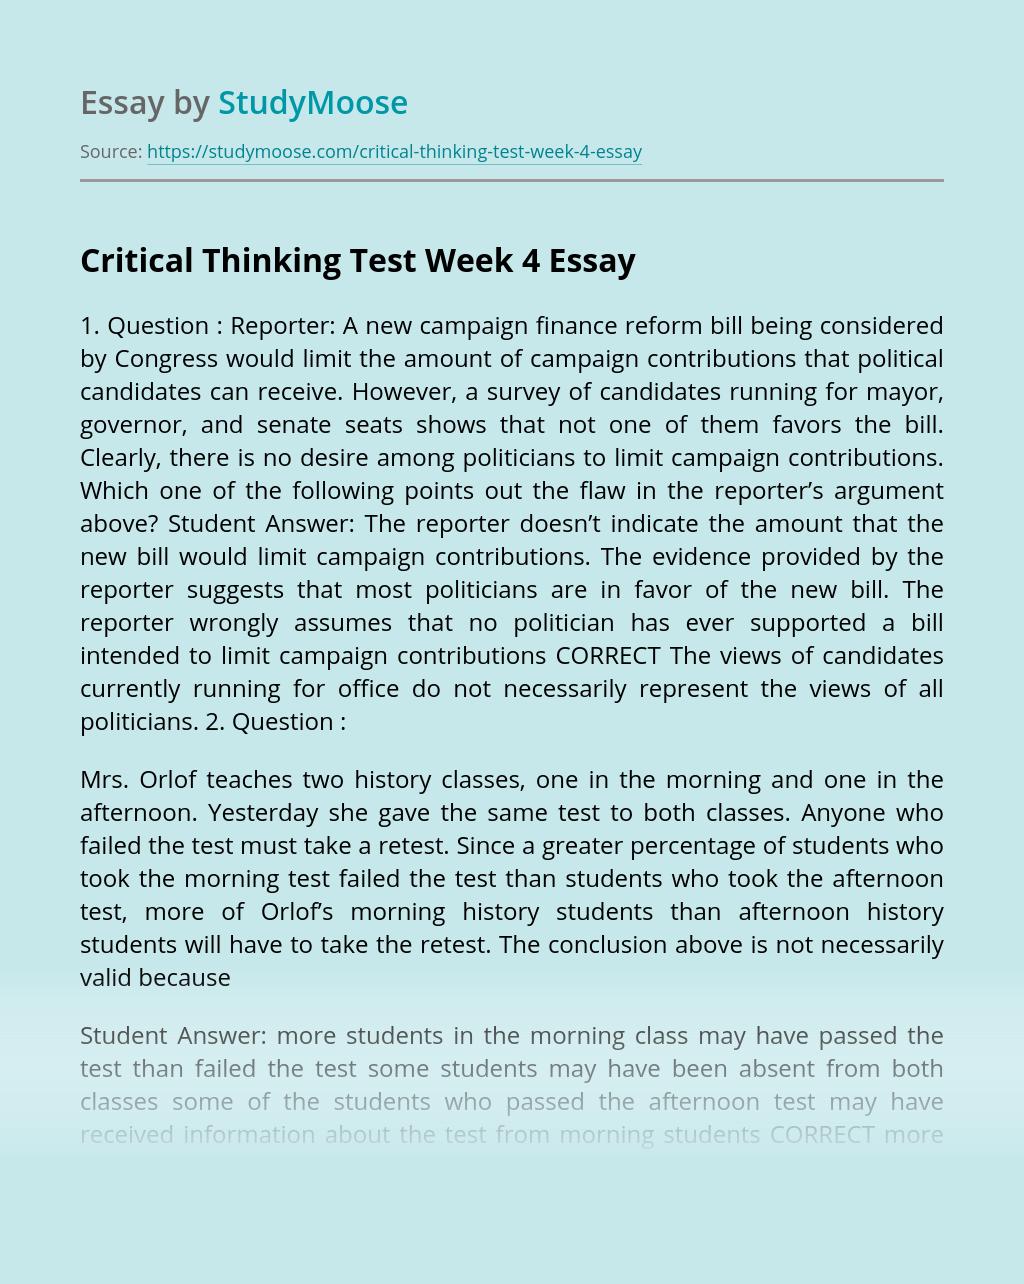 Critical Thinking Test Week 4